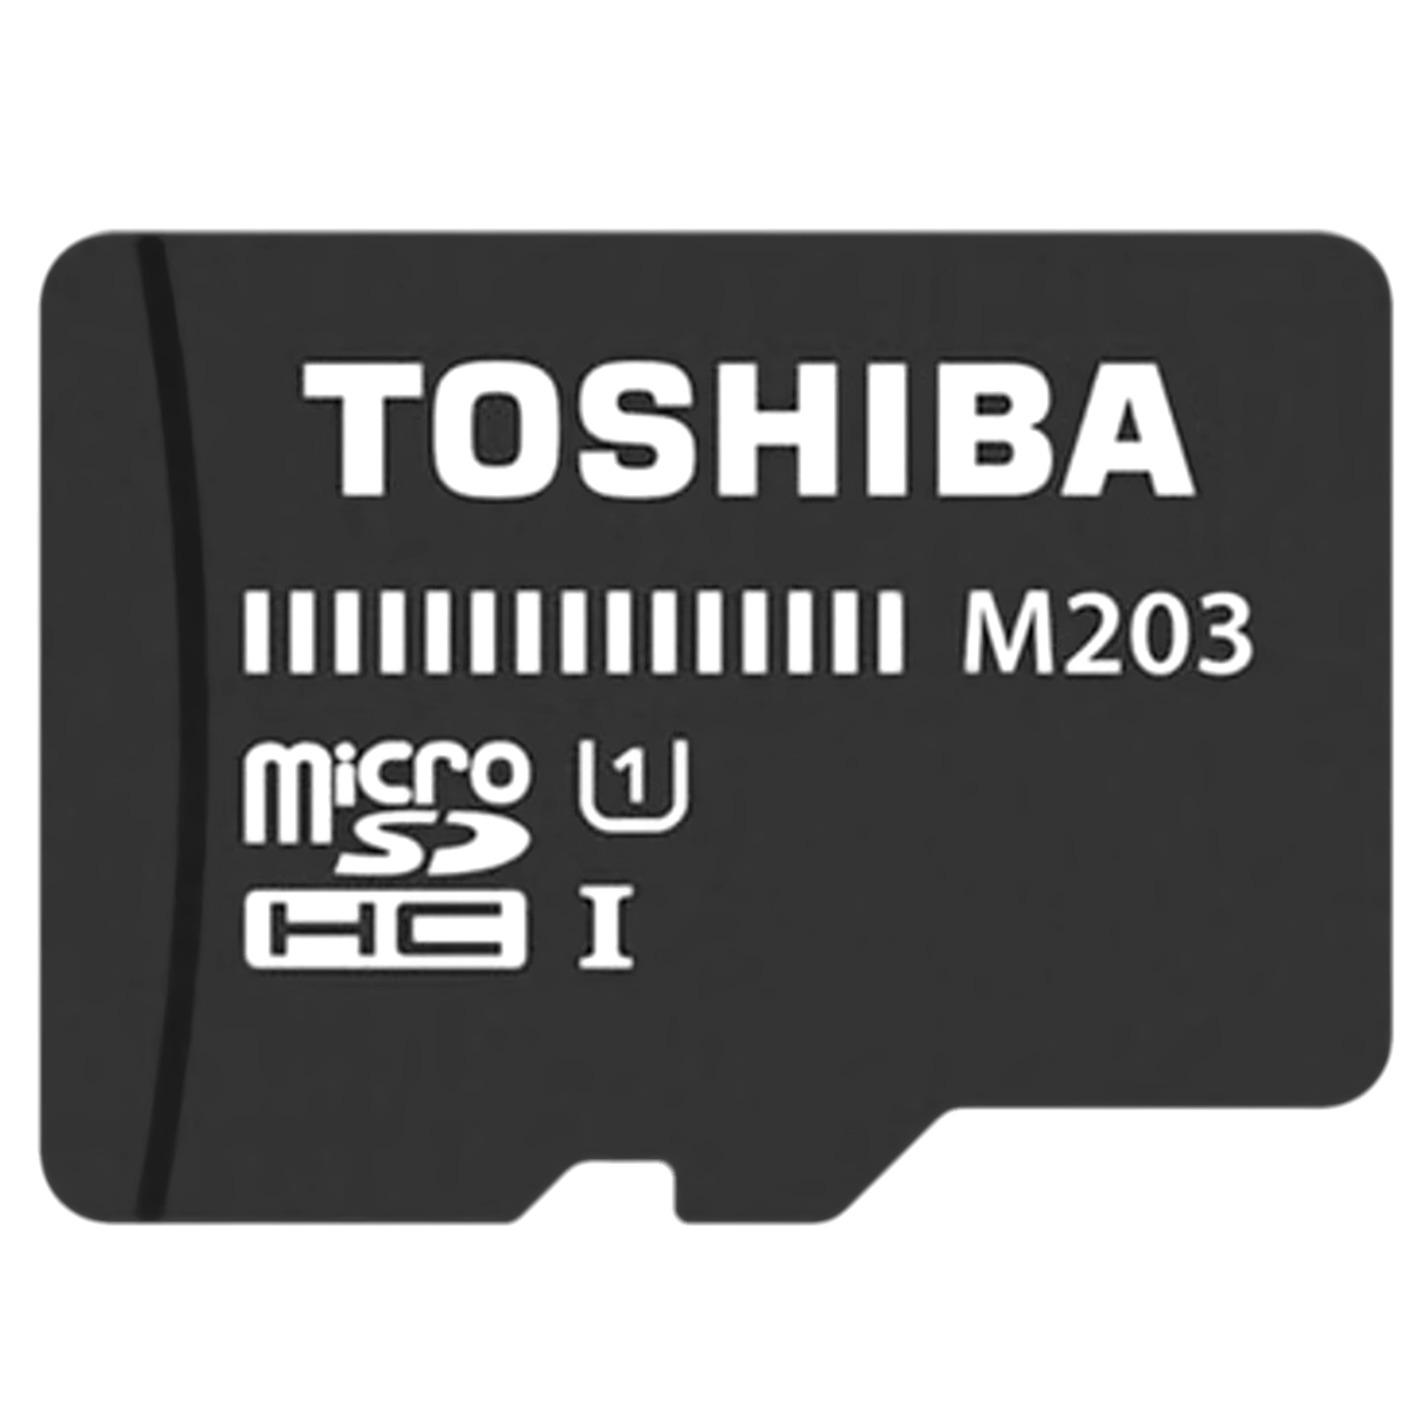 Toshiba micro sd kaart MicroSD Class 10 High Speed M203 32GB zwart